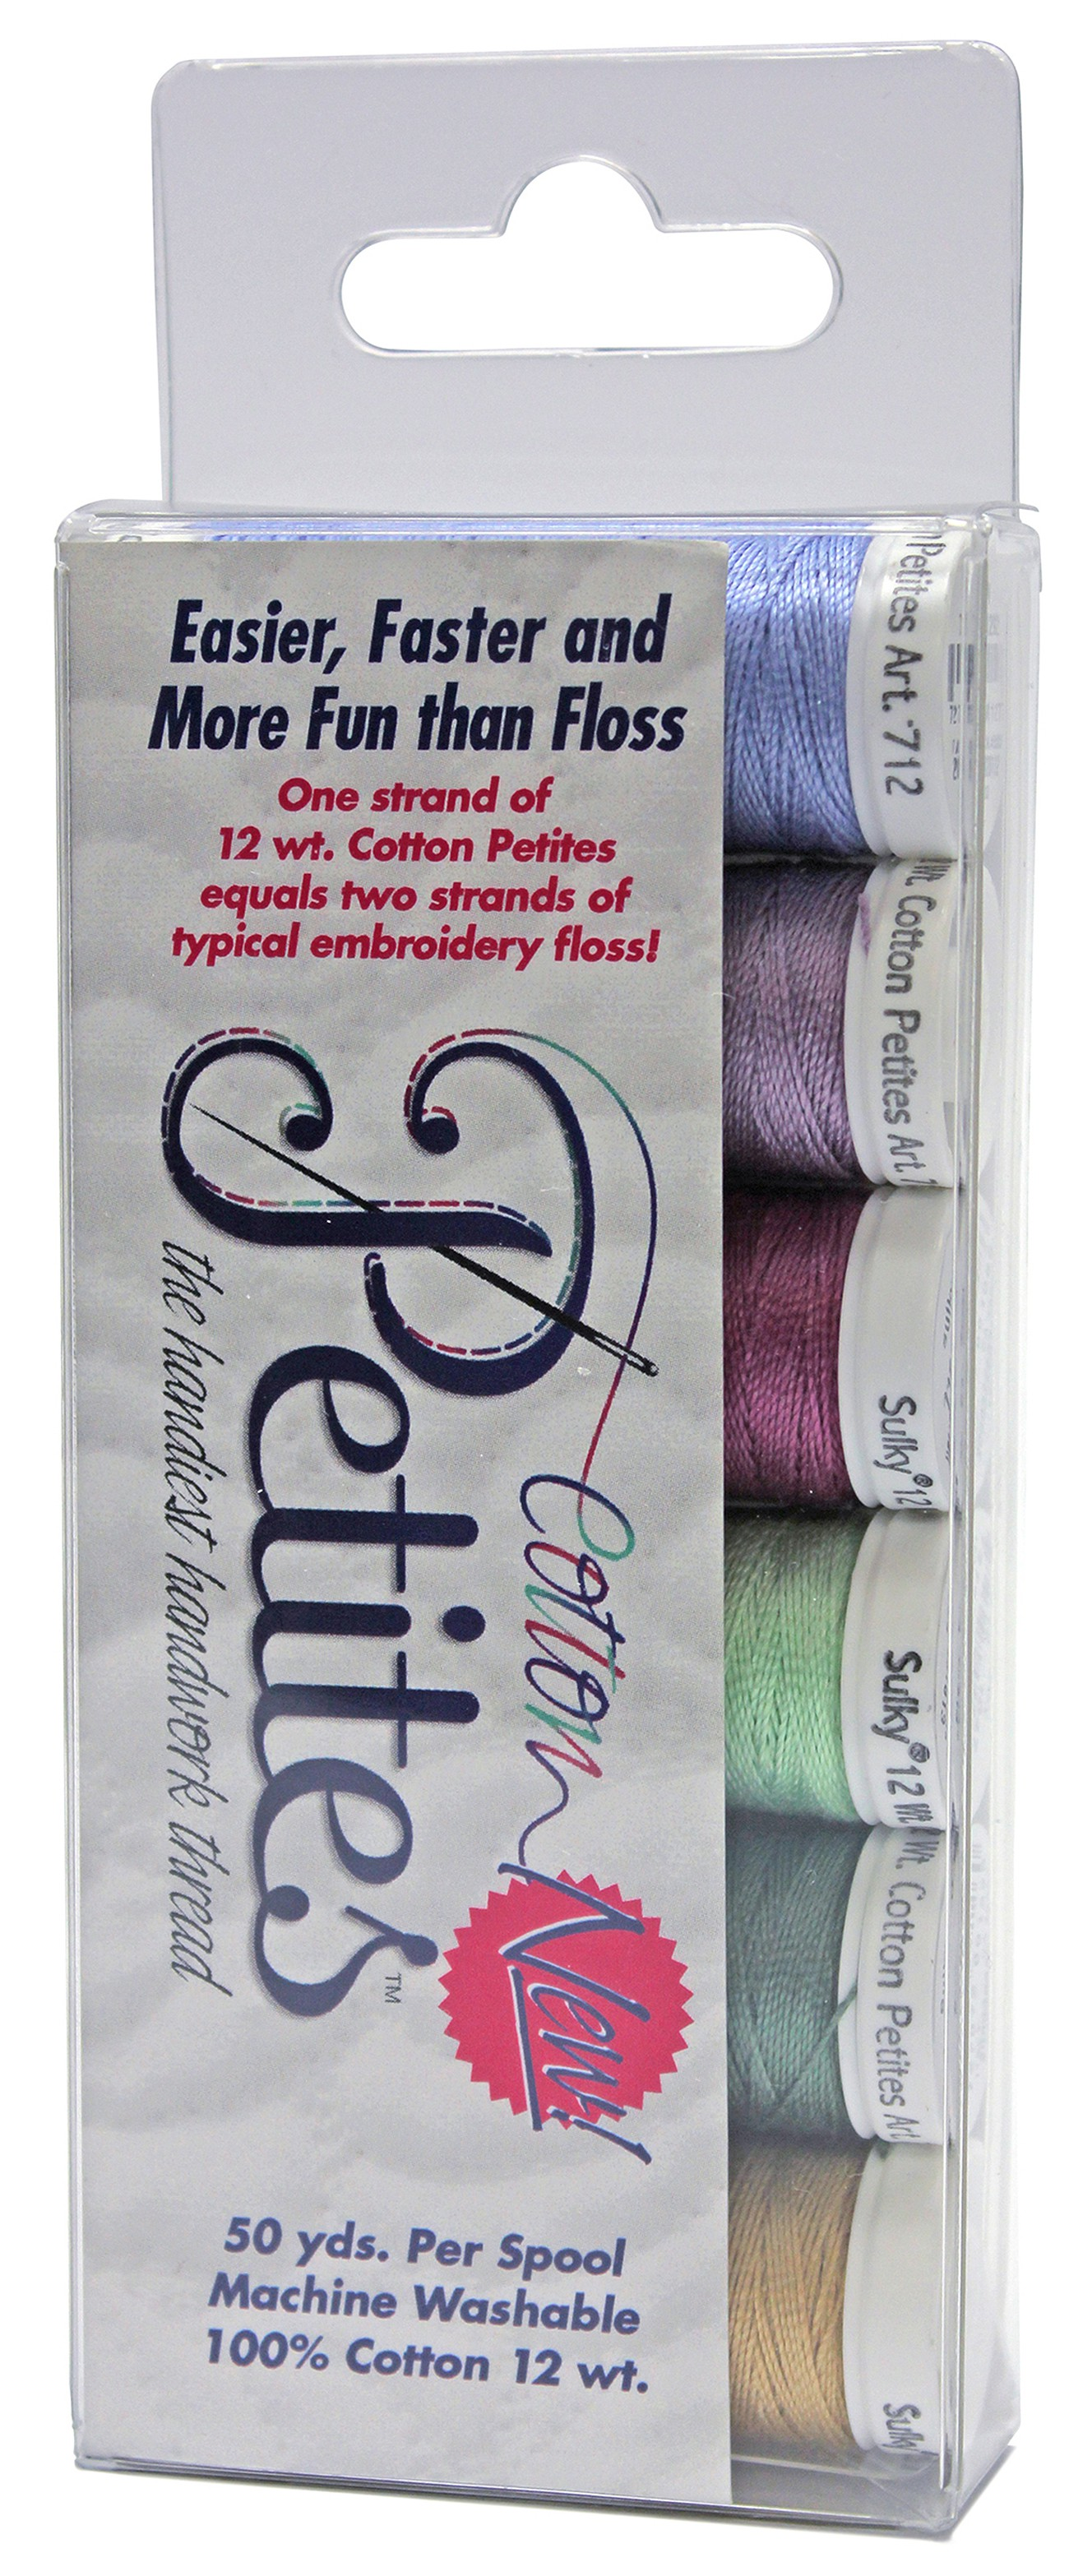 12 wt thread 6 colors Neutrals Cotton Petites Sulky thread the handiest handwork thread